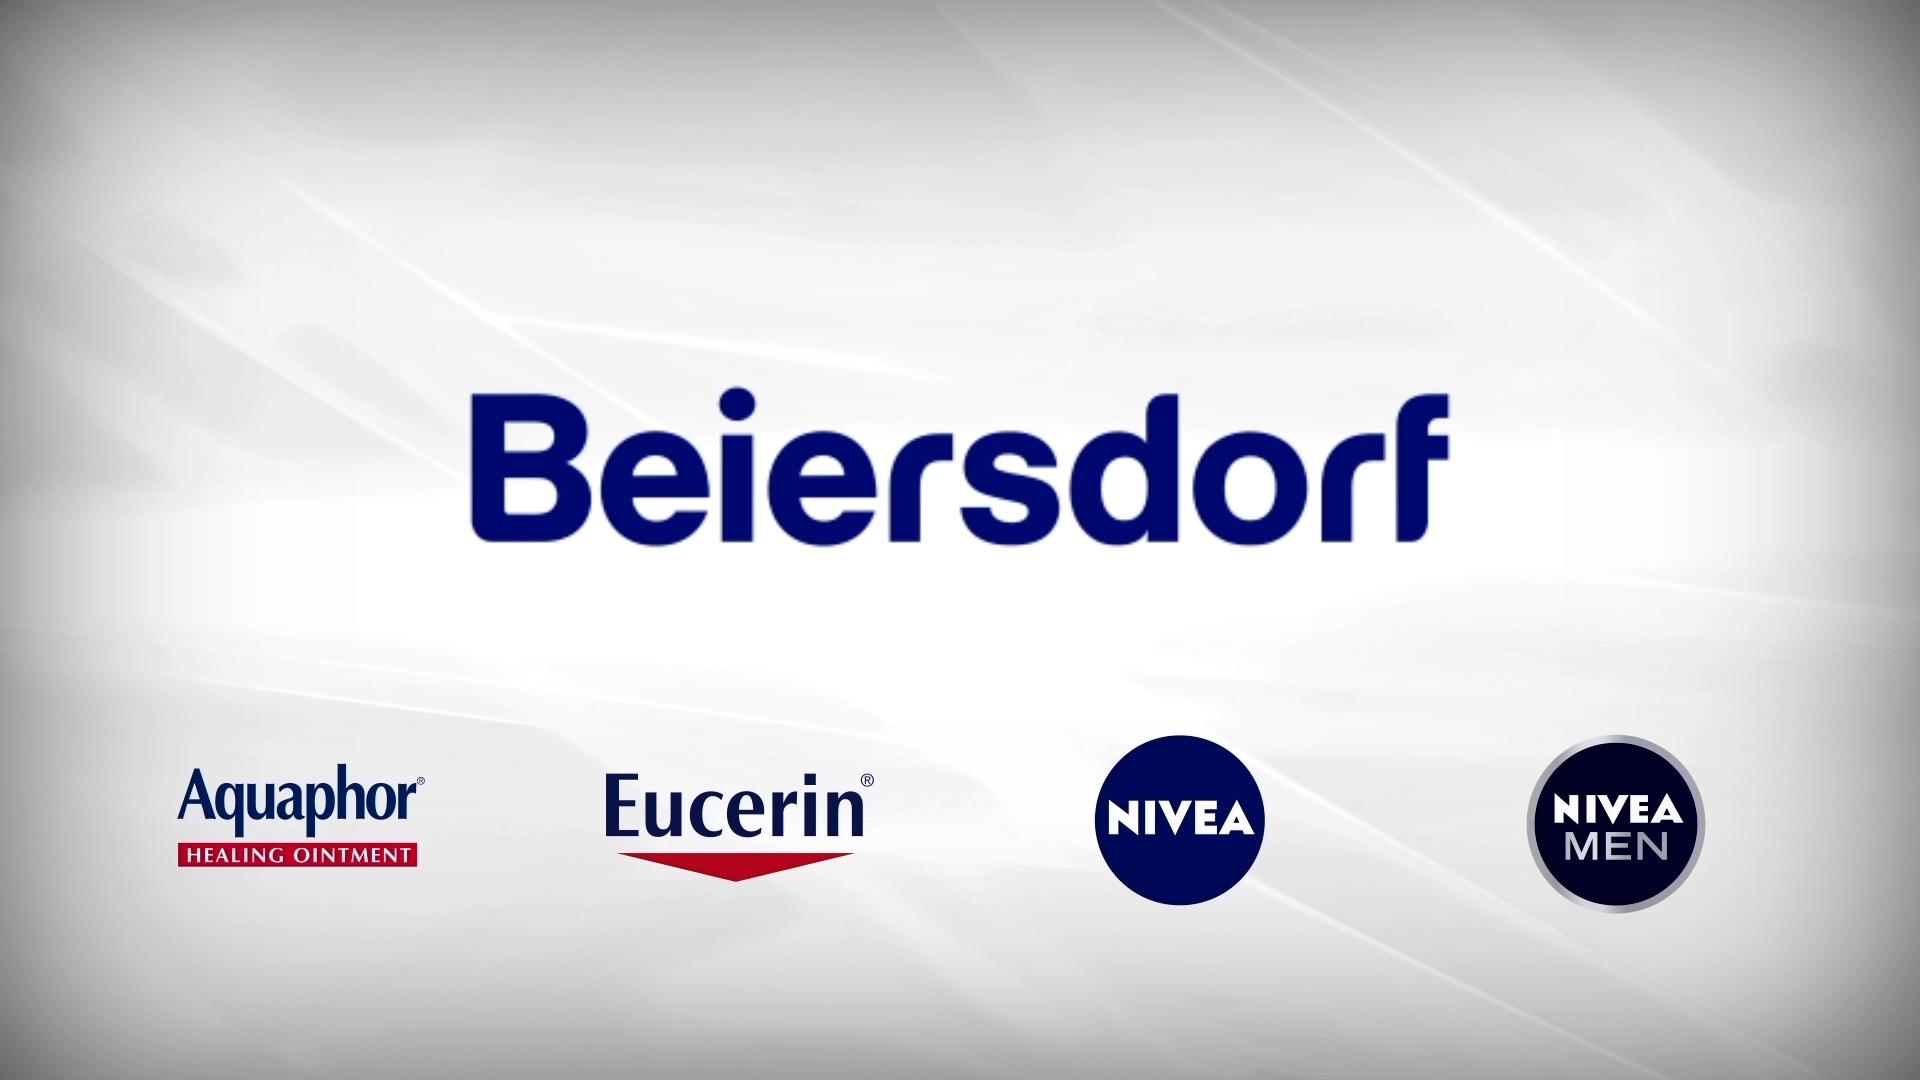 Beiersdorf / NIVEA